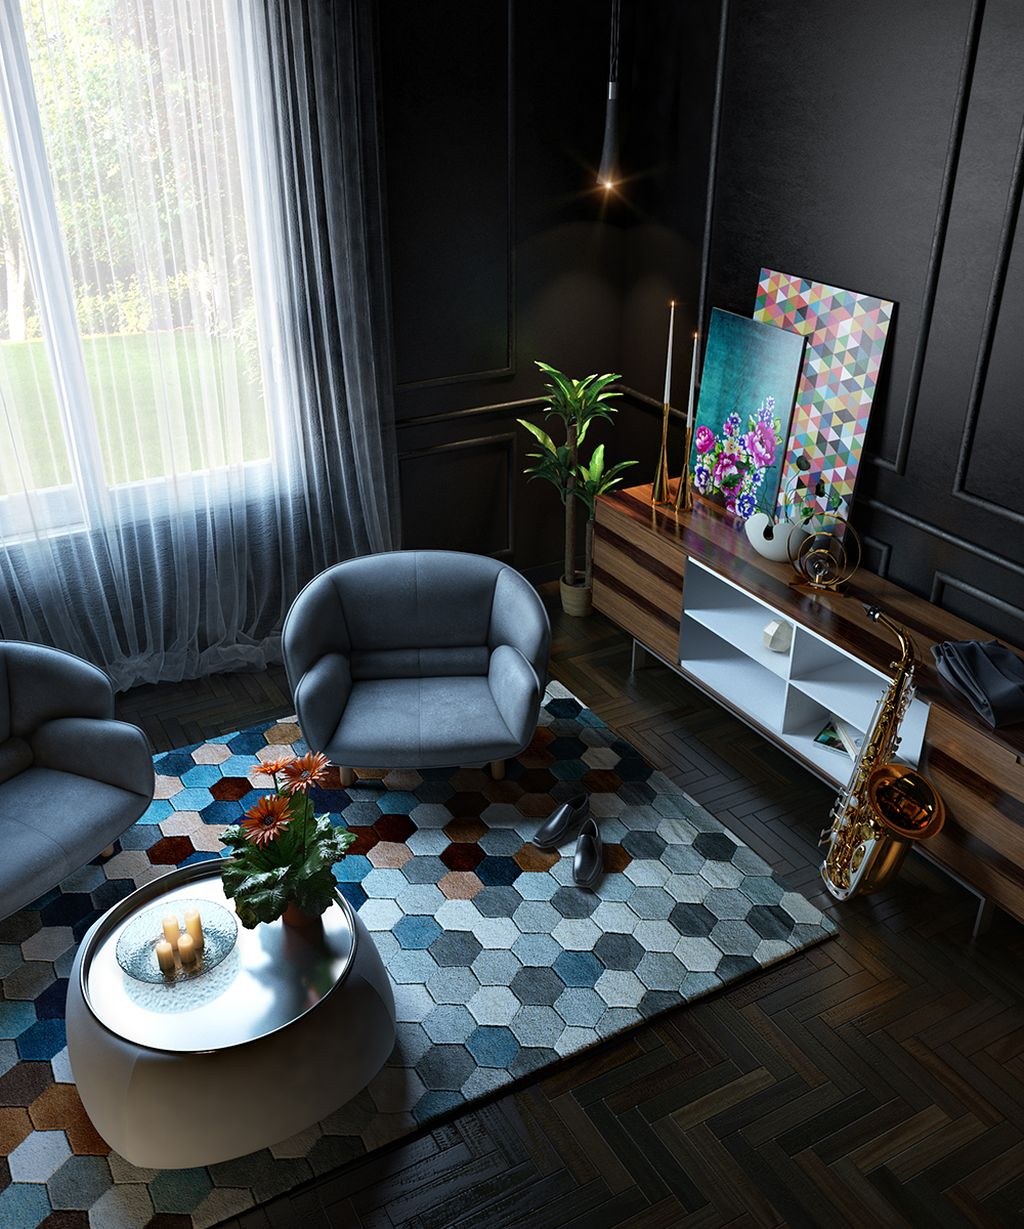 Brilliant colors room